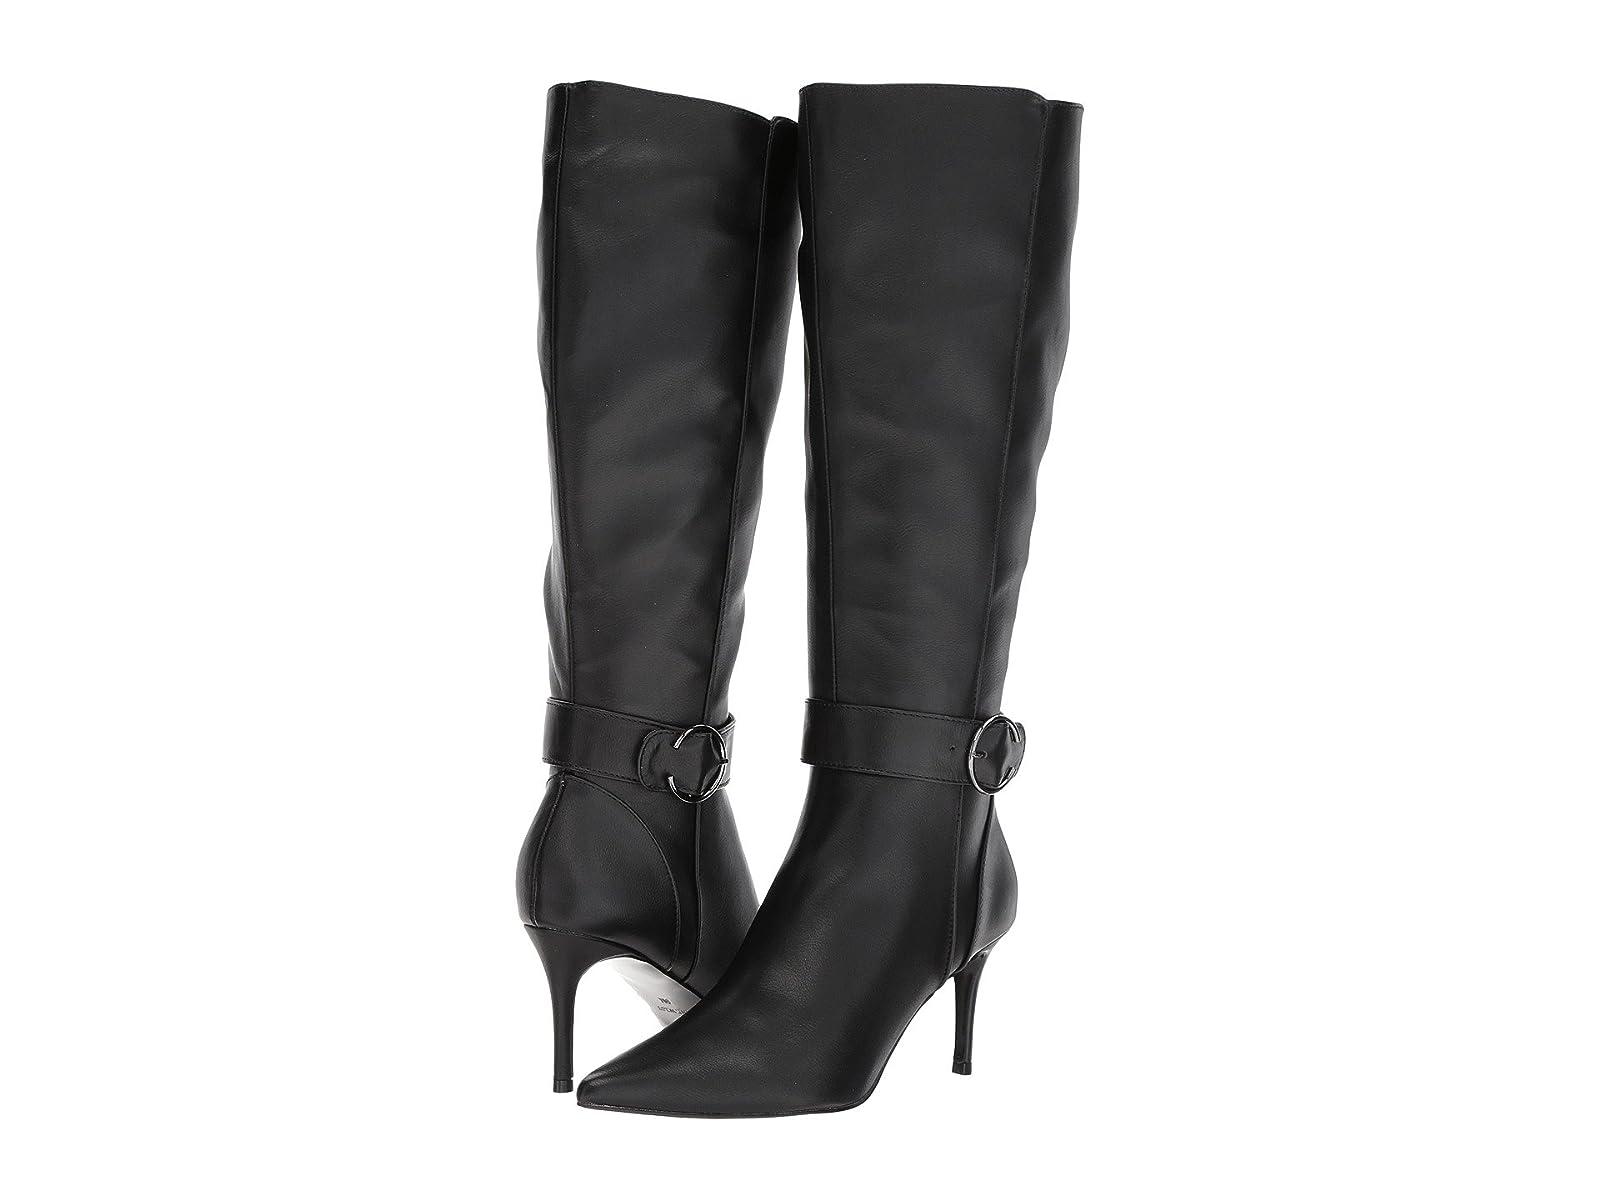 Nine West Moretalkn - Wide ShaftCheap and distinctive eye-catching shoes